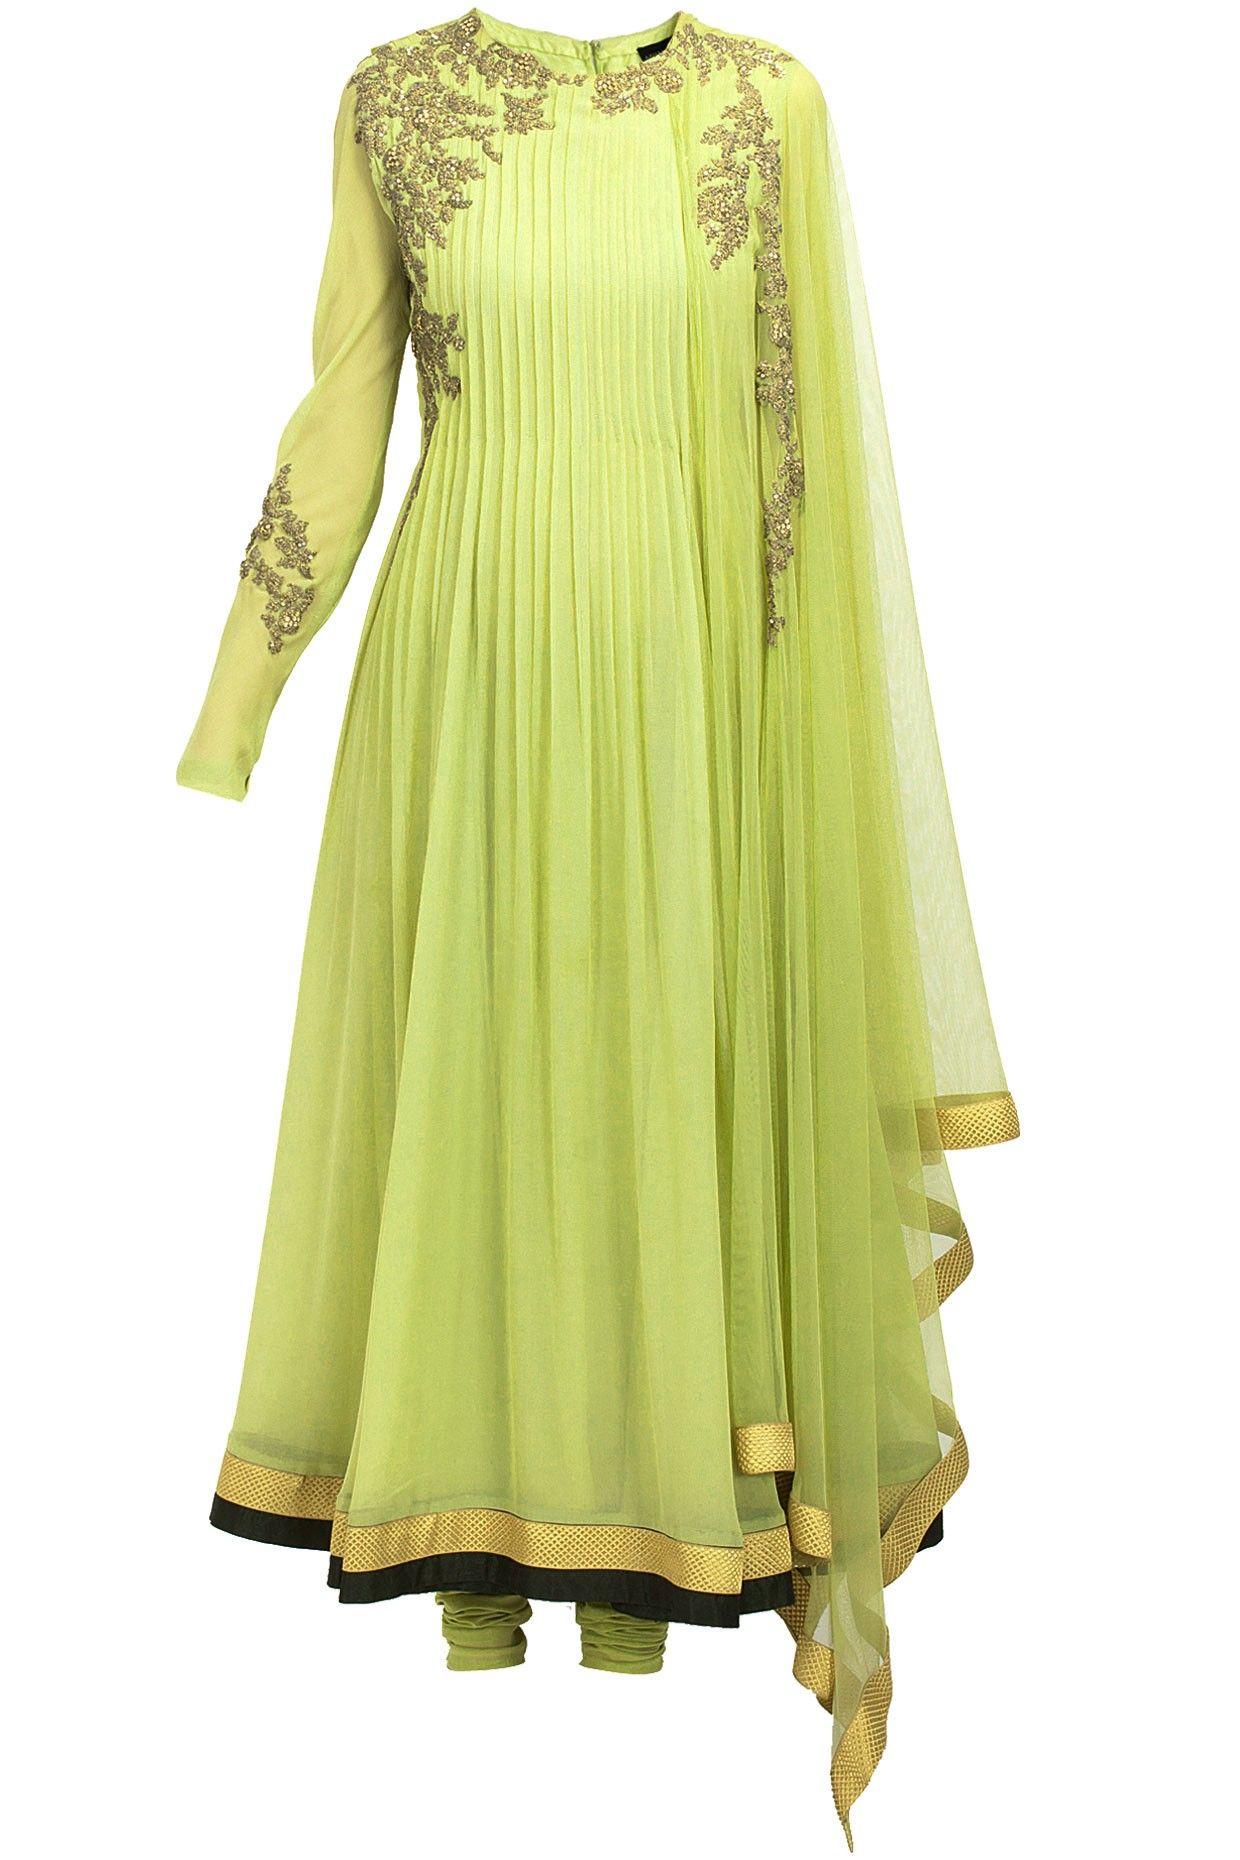 Ridhi mehra dress pinterest mint green anarkali and indian